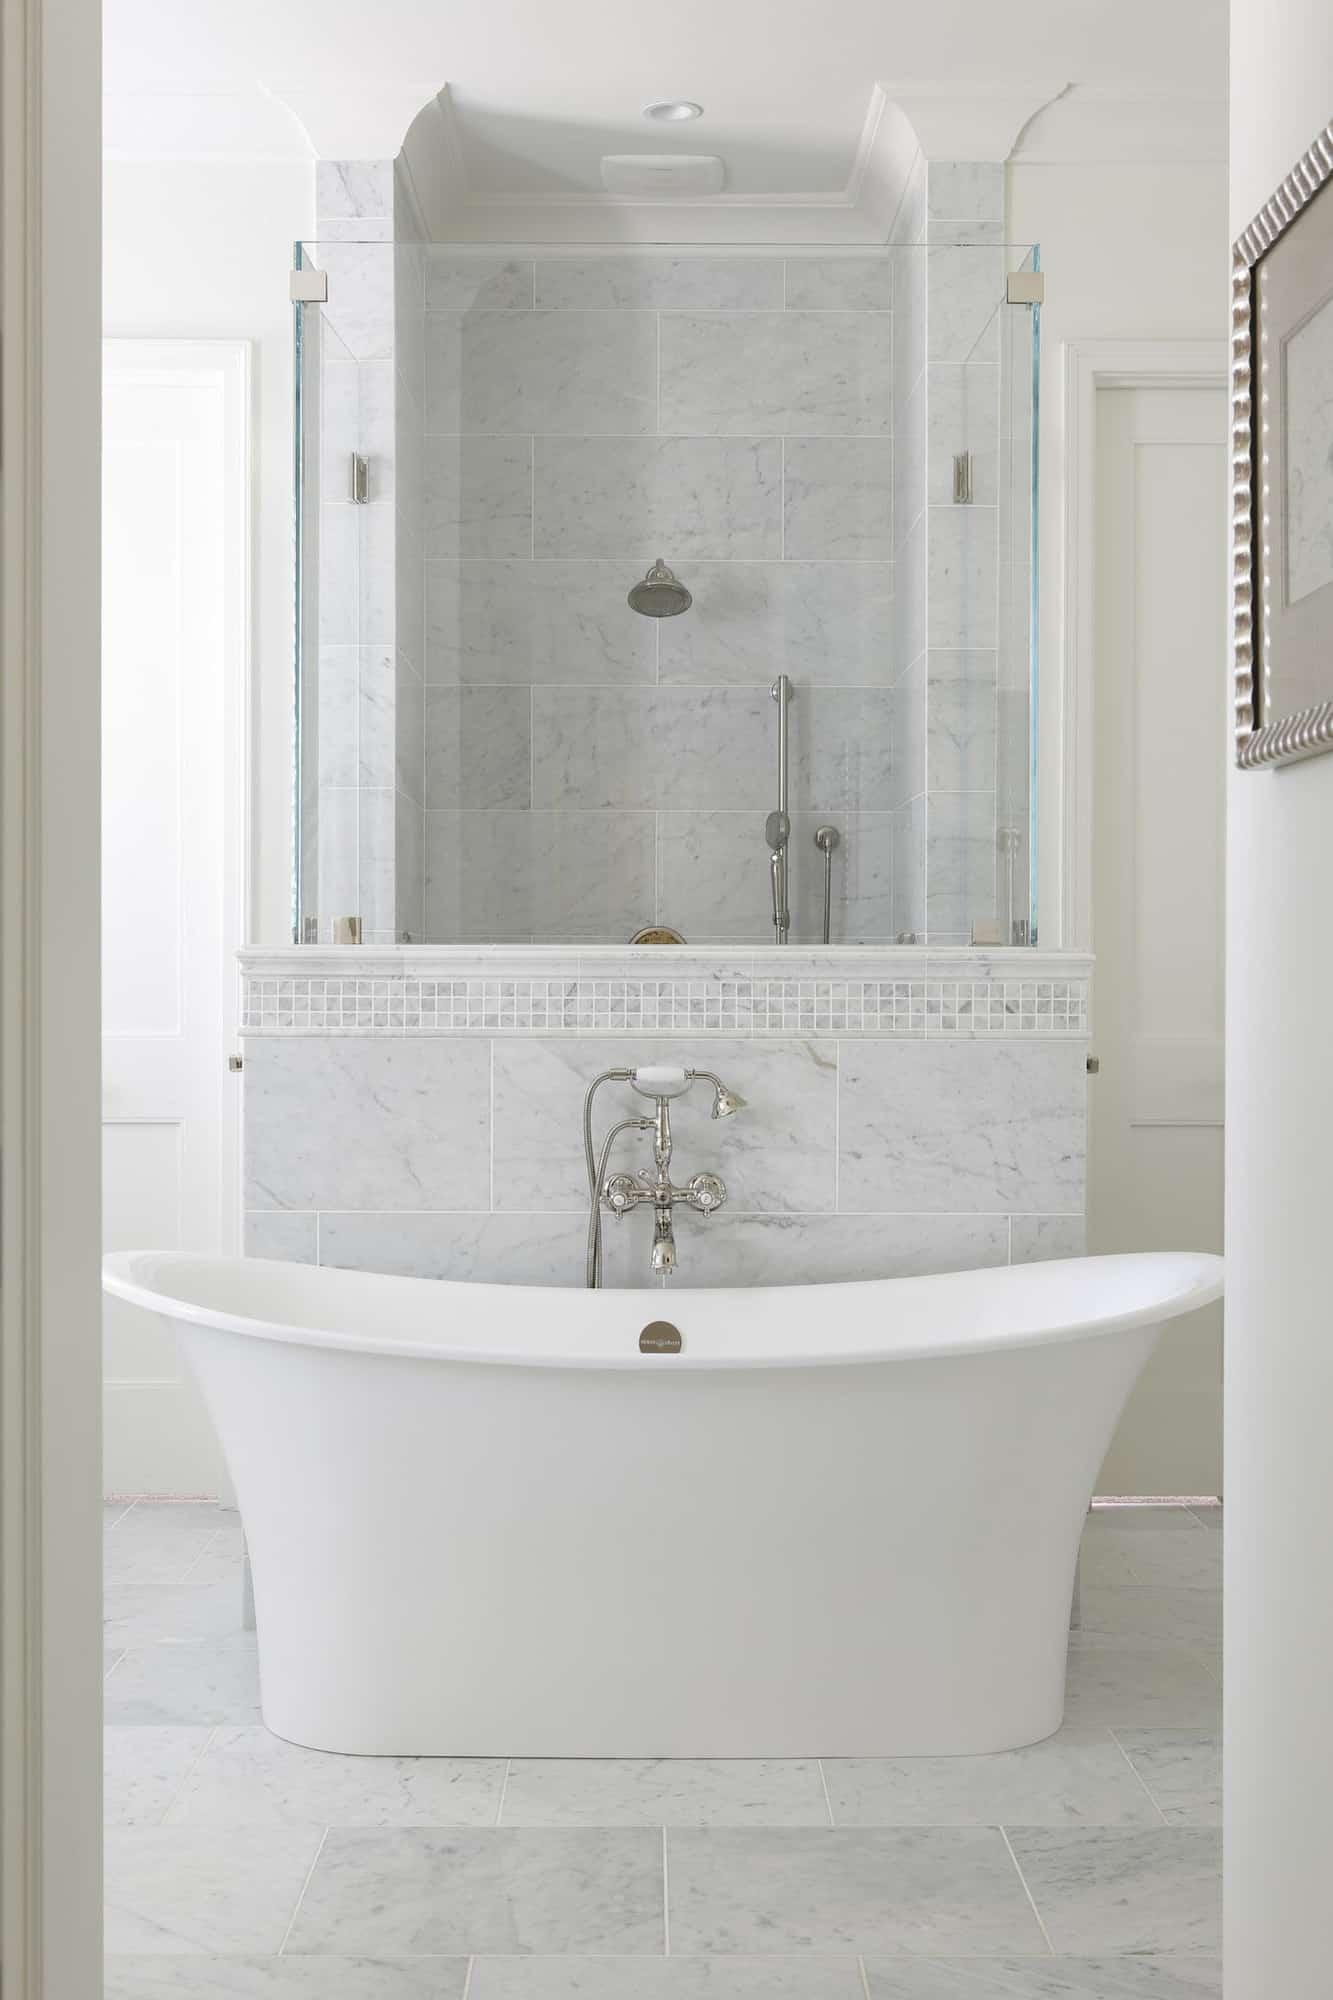 transitional-style-bathroom-soaking-tub